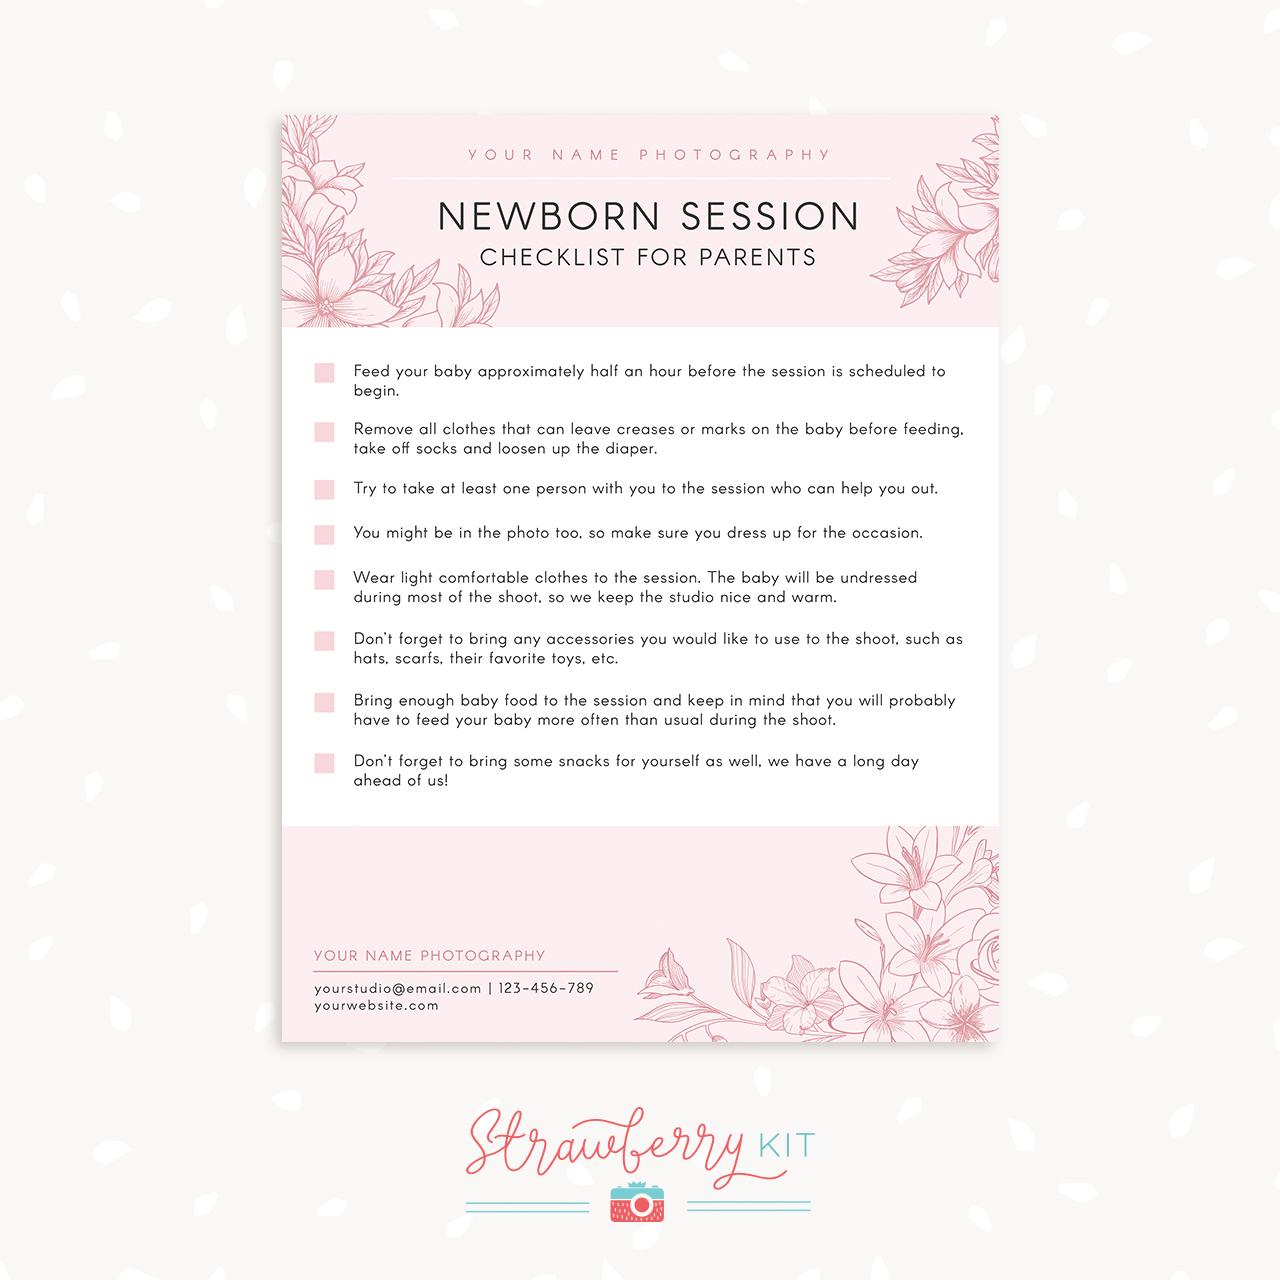 newborn photography checklist for parents strawberry kit